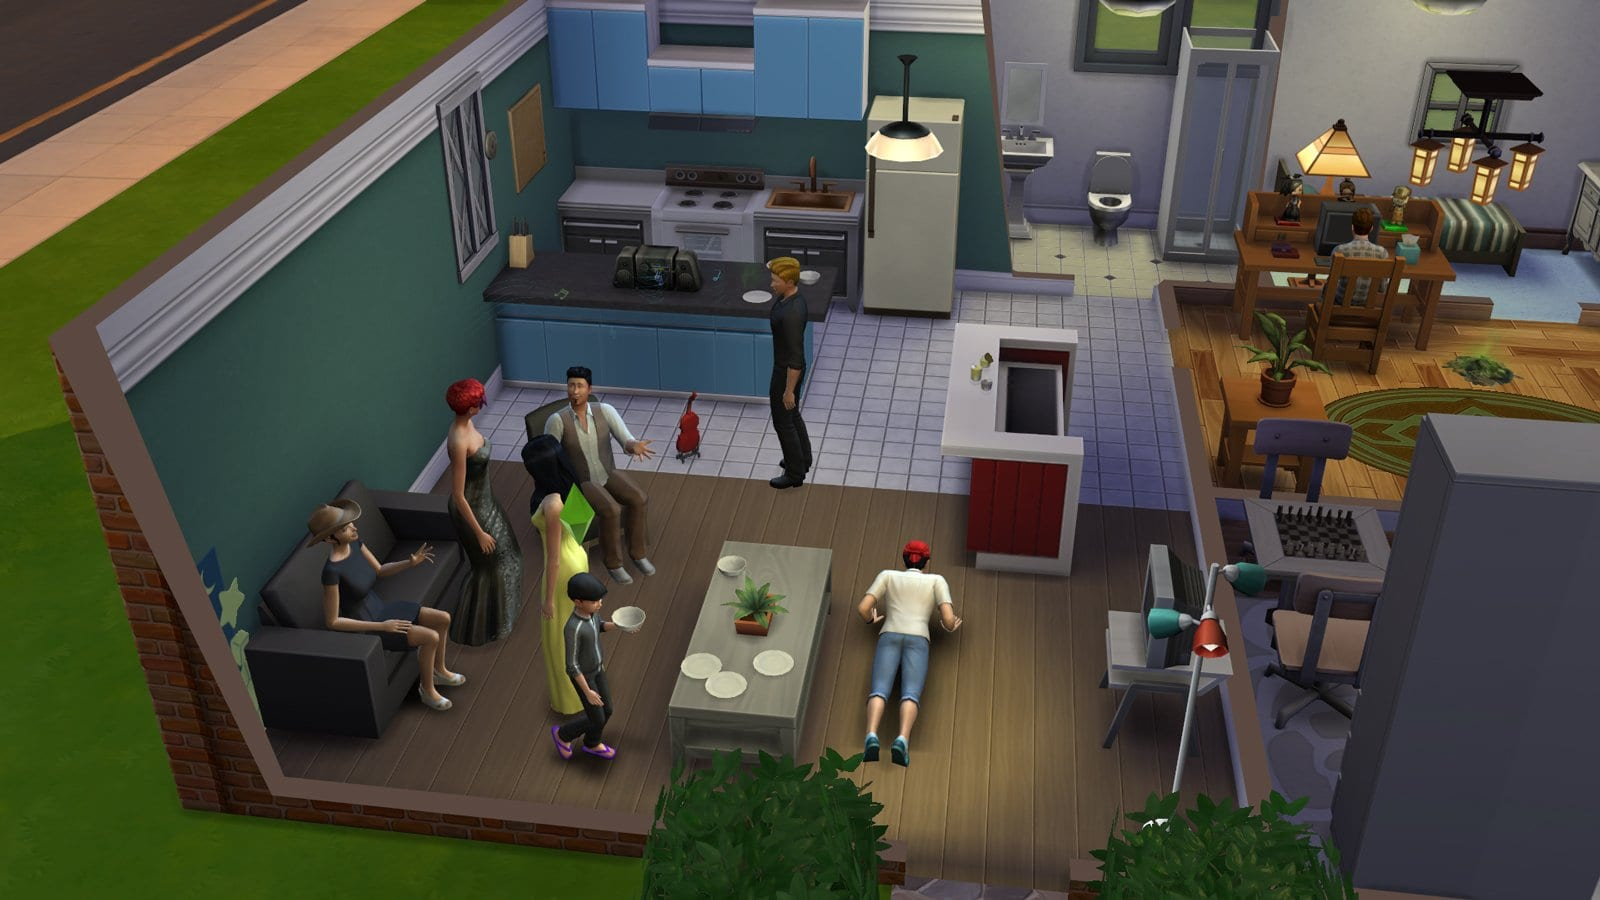 The Sims 4 - Xbox Game Pass gry dla dzieci